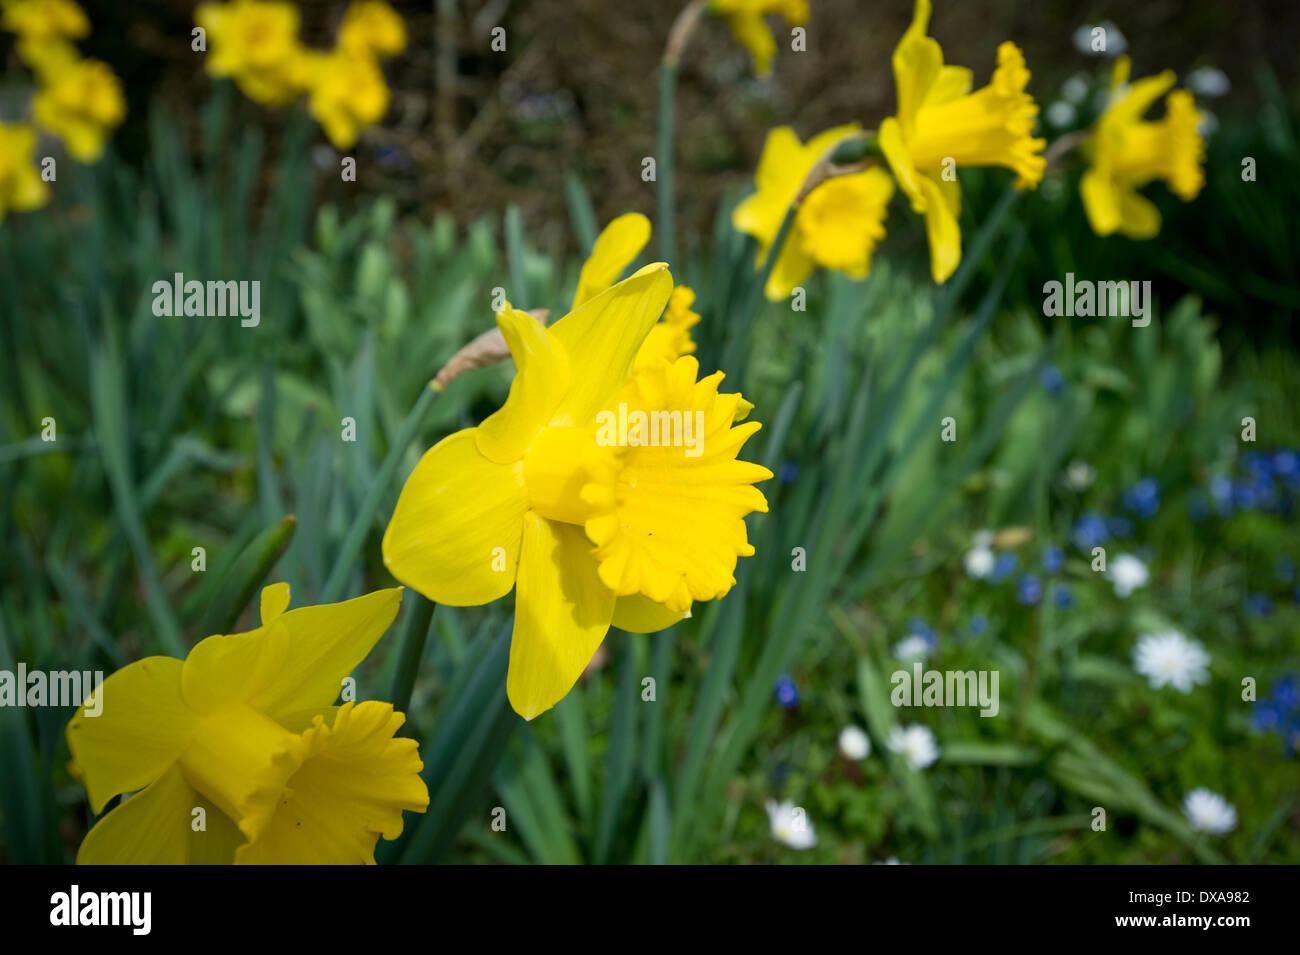 Spring Flowers In Uk Stock Photo 67838962 Alamy